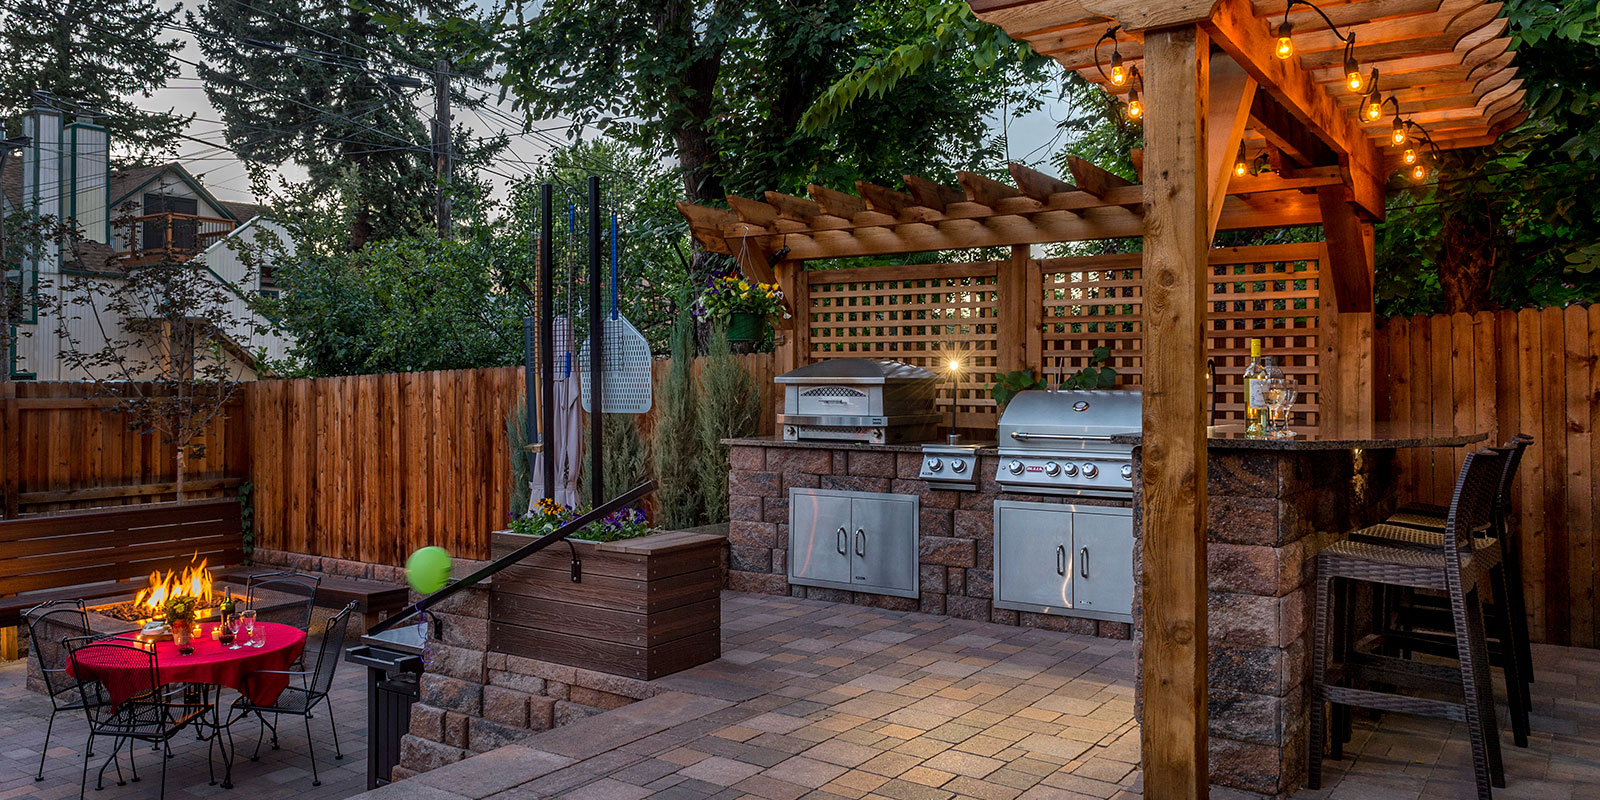 Outdoor Kitchen, Pizza Oven, Fire Pit, Paver Patio, Pergola ...